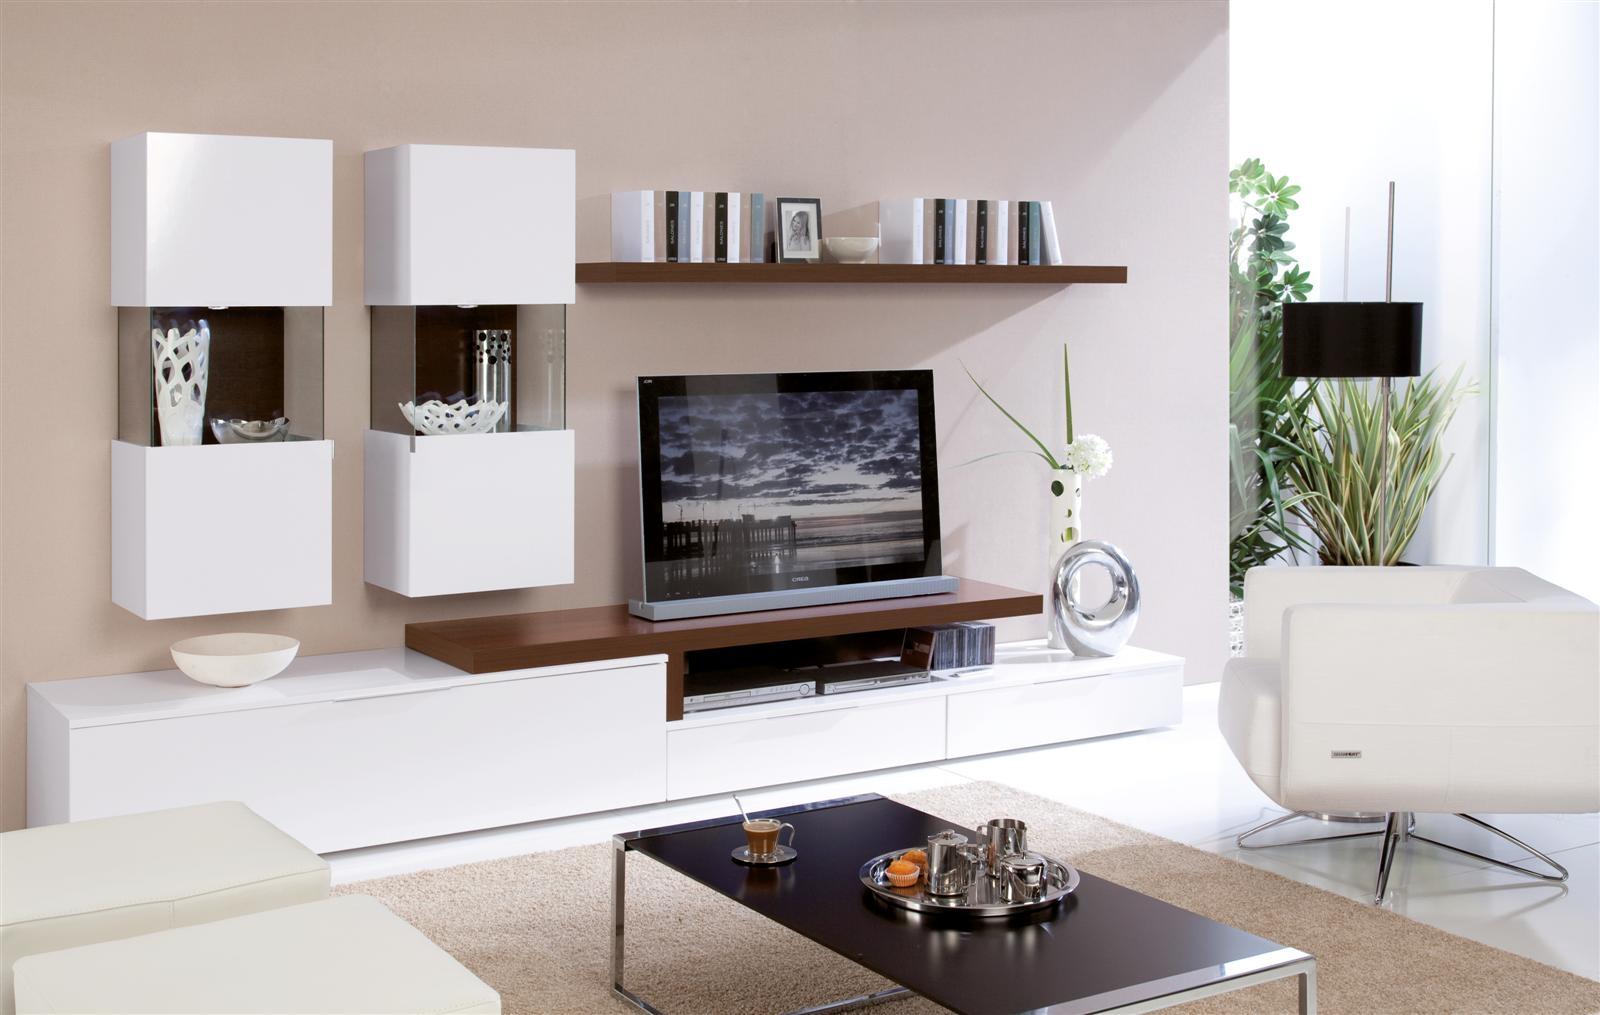 tv unit design ideas photos photo - 3